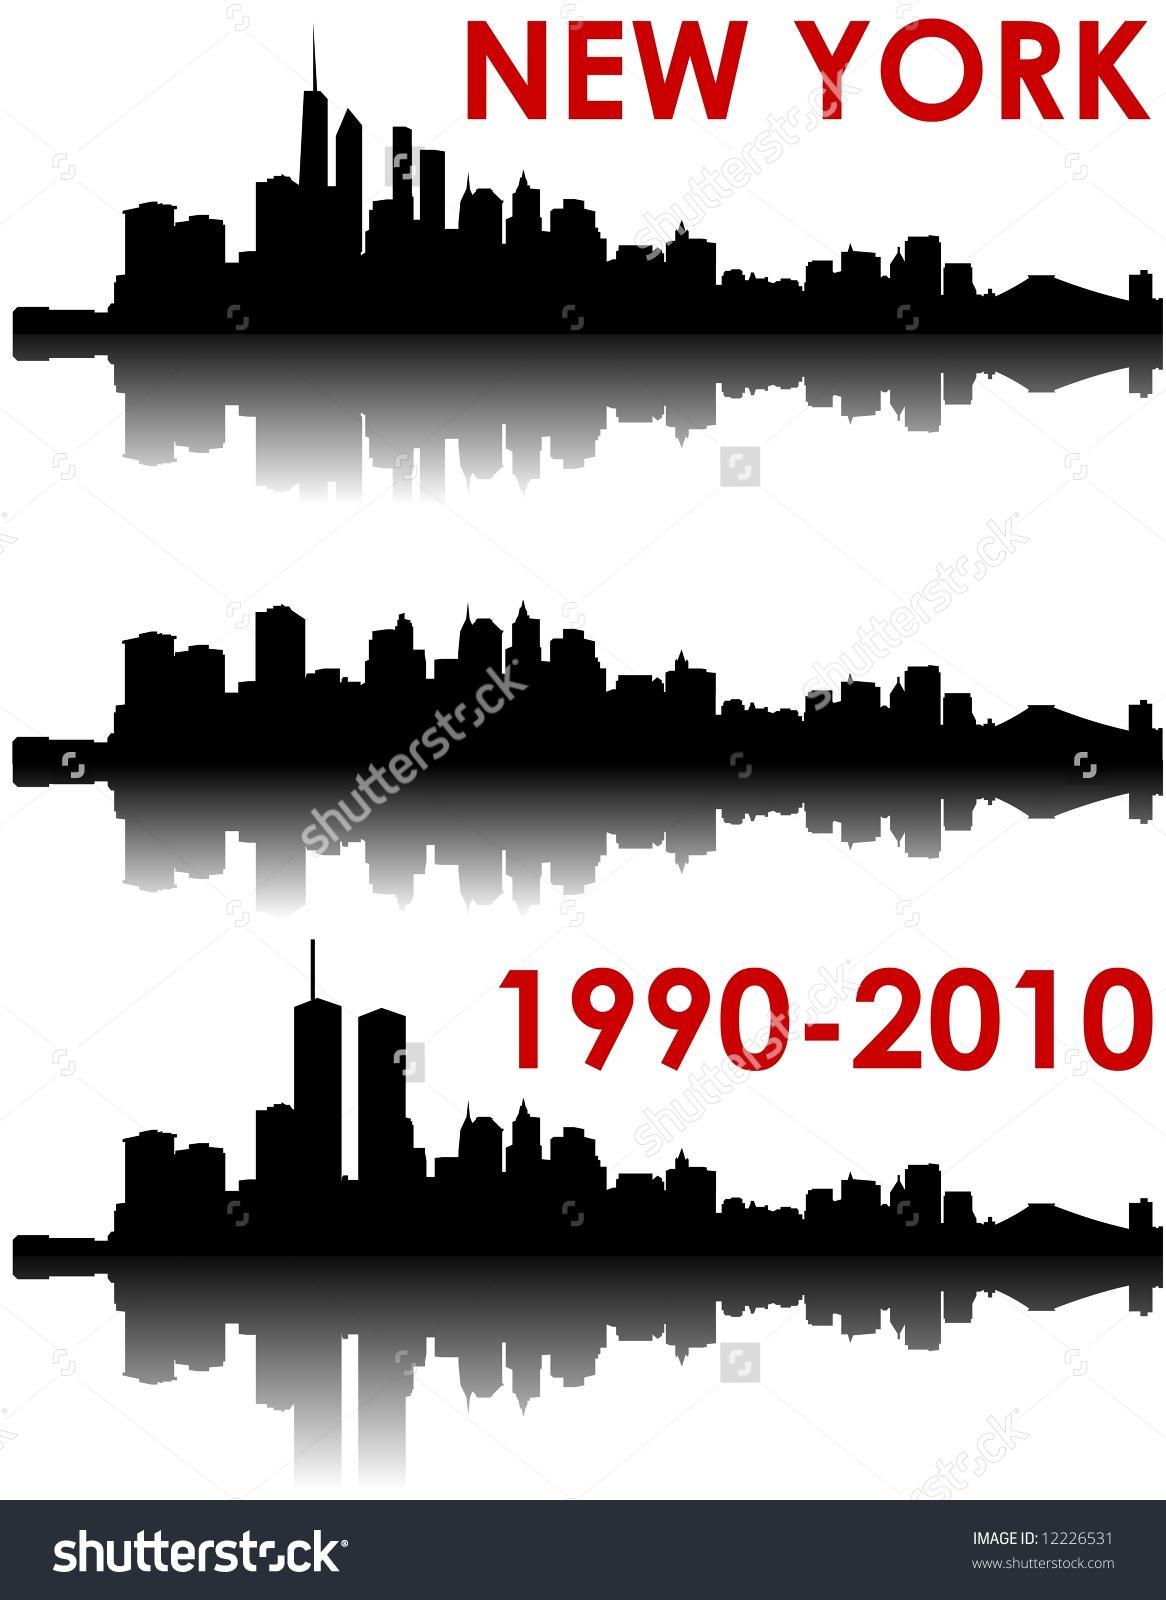 New York Skyline 19902010 Old World Stock Illustration 12226531.